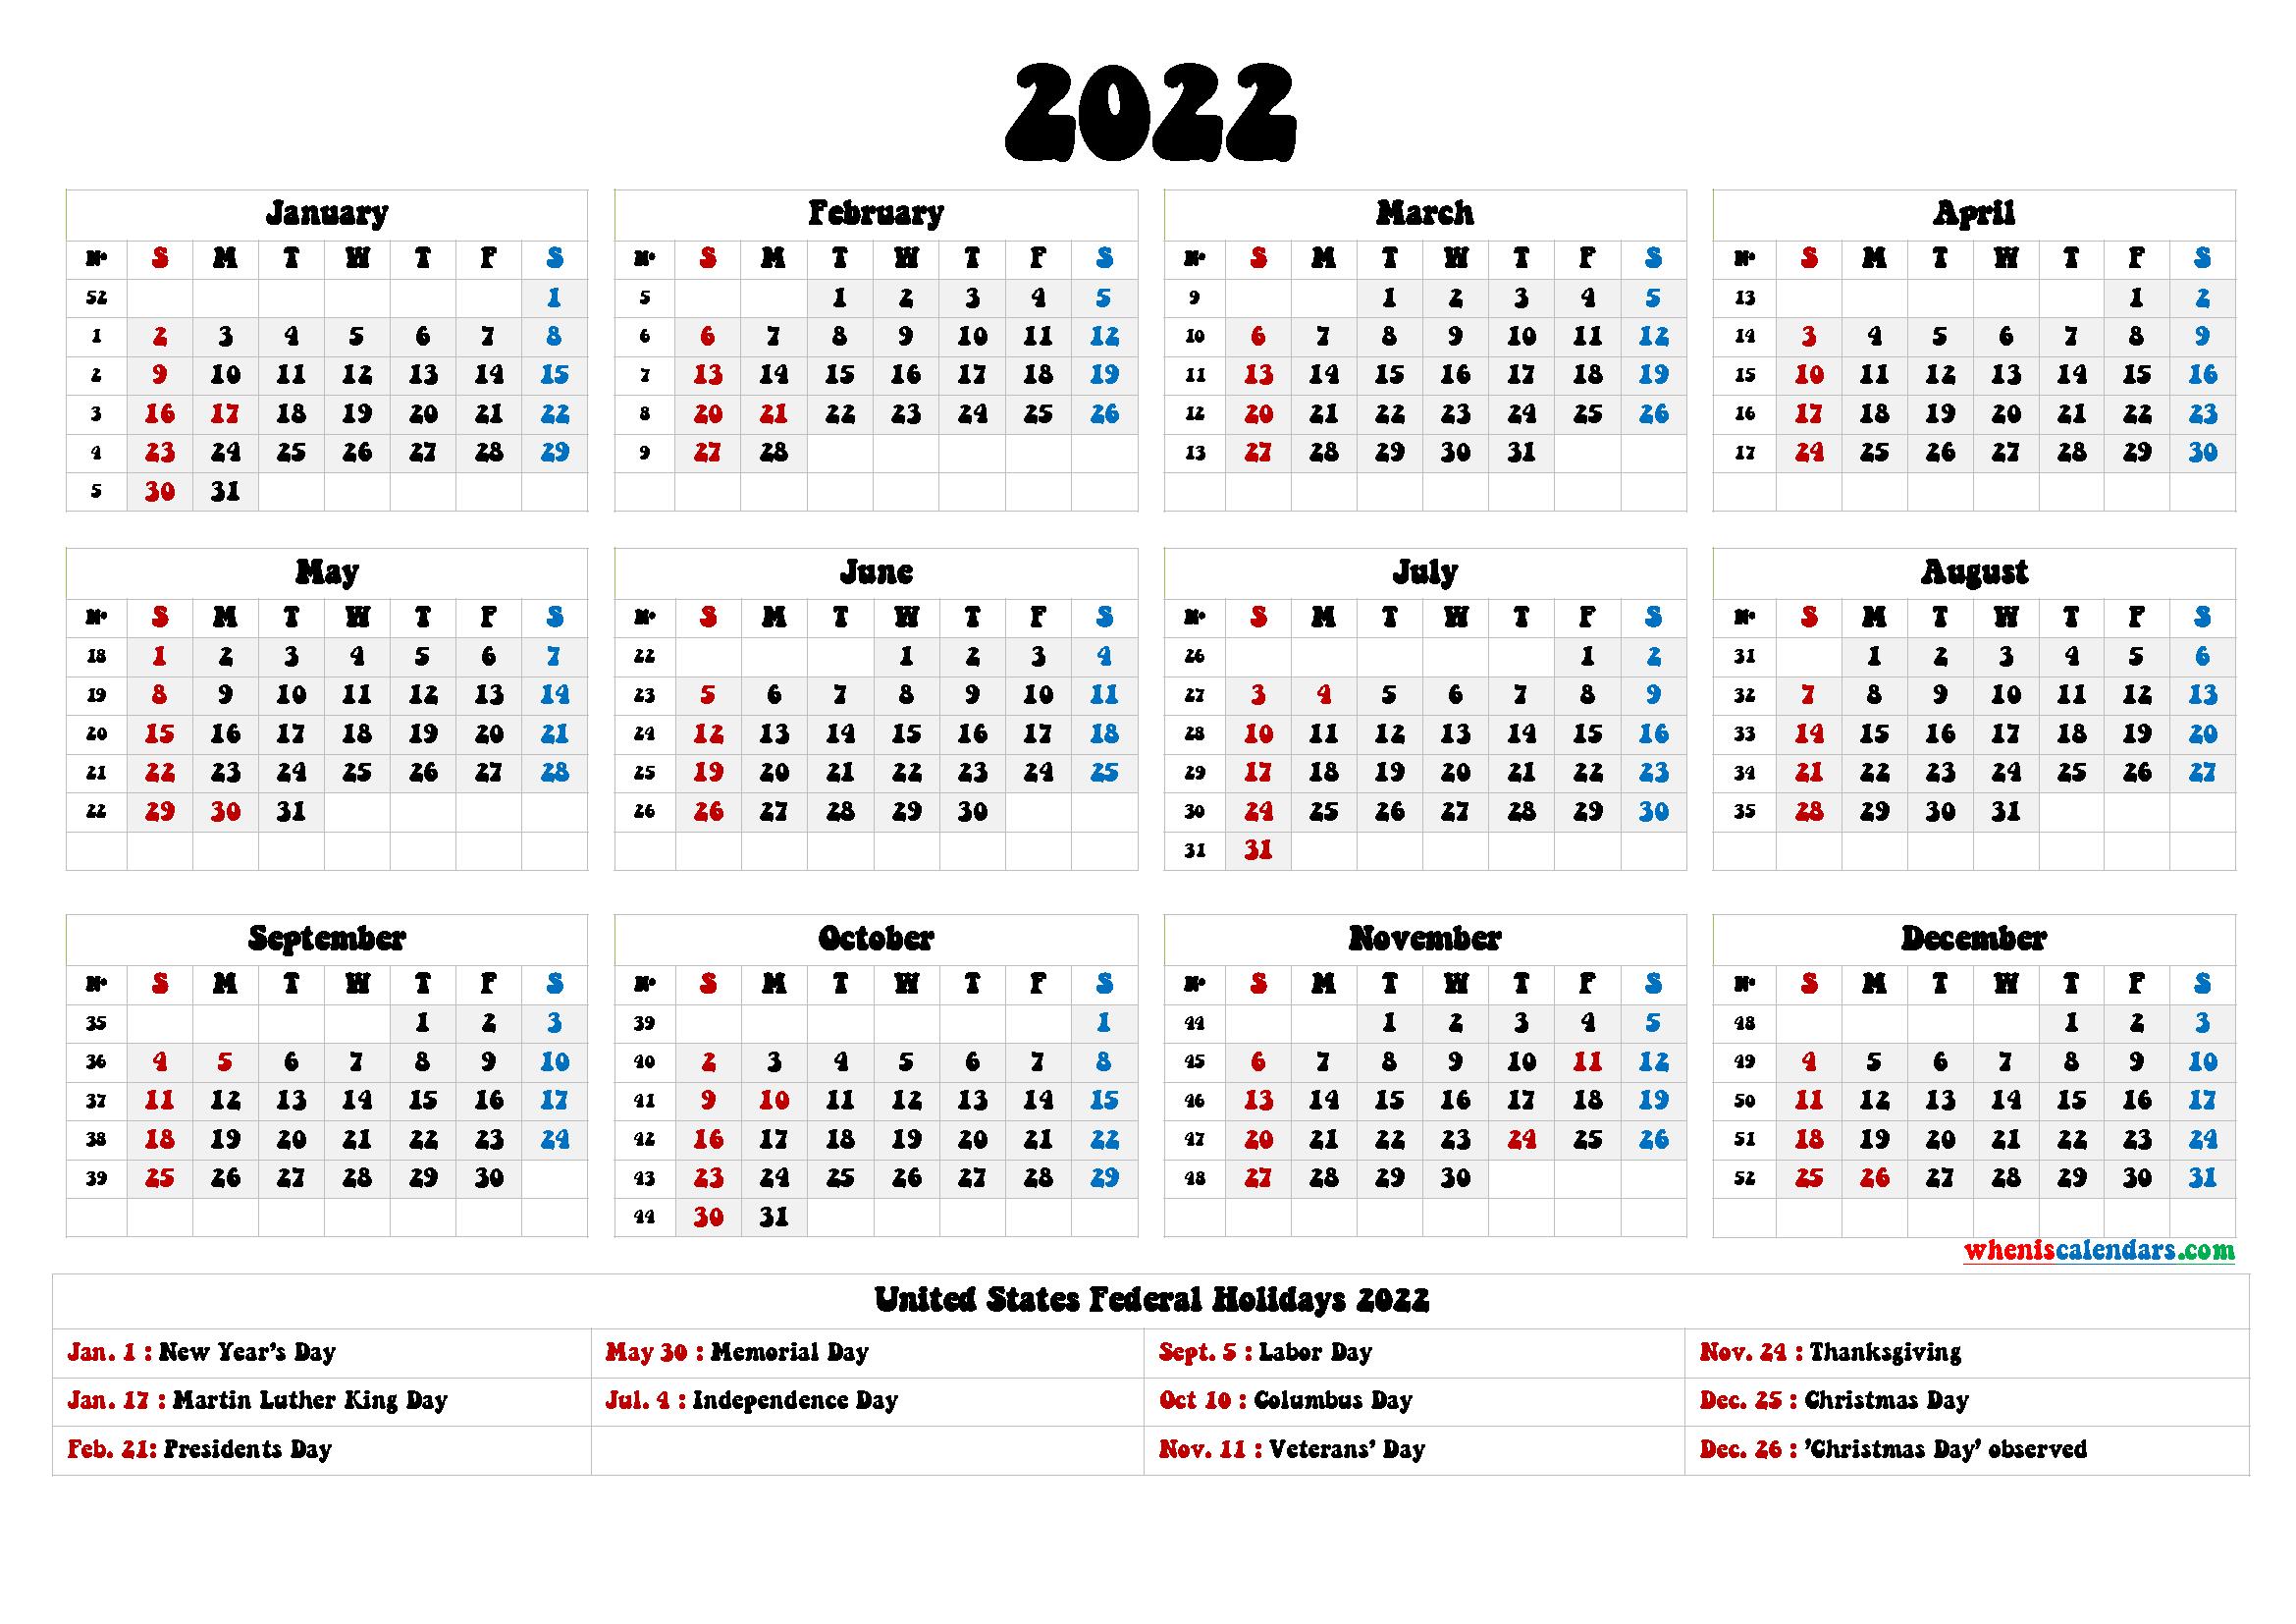 20+ 2022 Holidays - Free Download Printable Calendar within 2022 Weekly Planner Printable Image